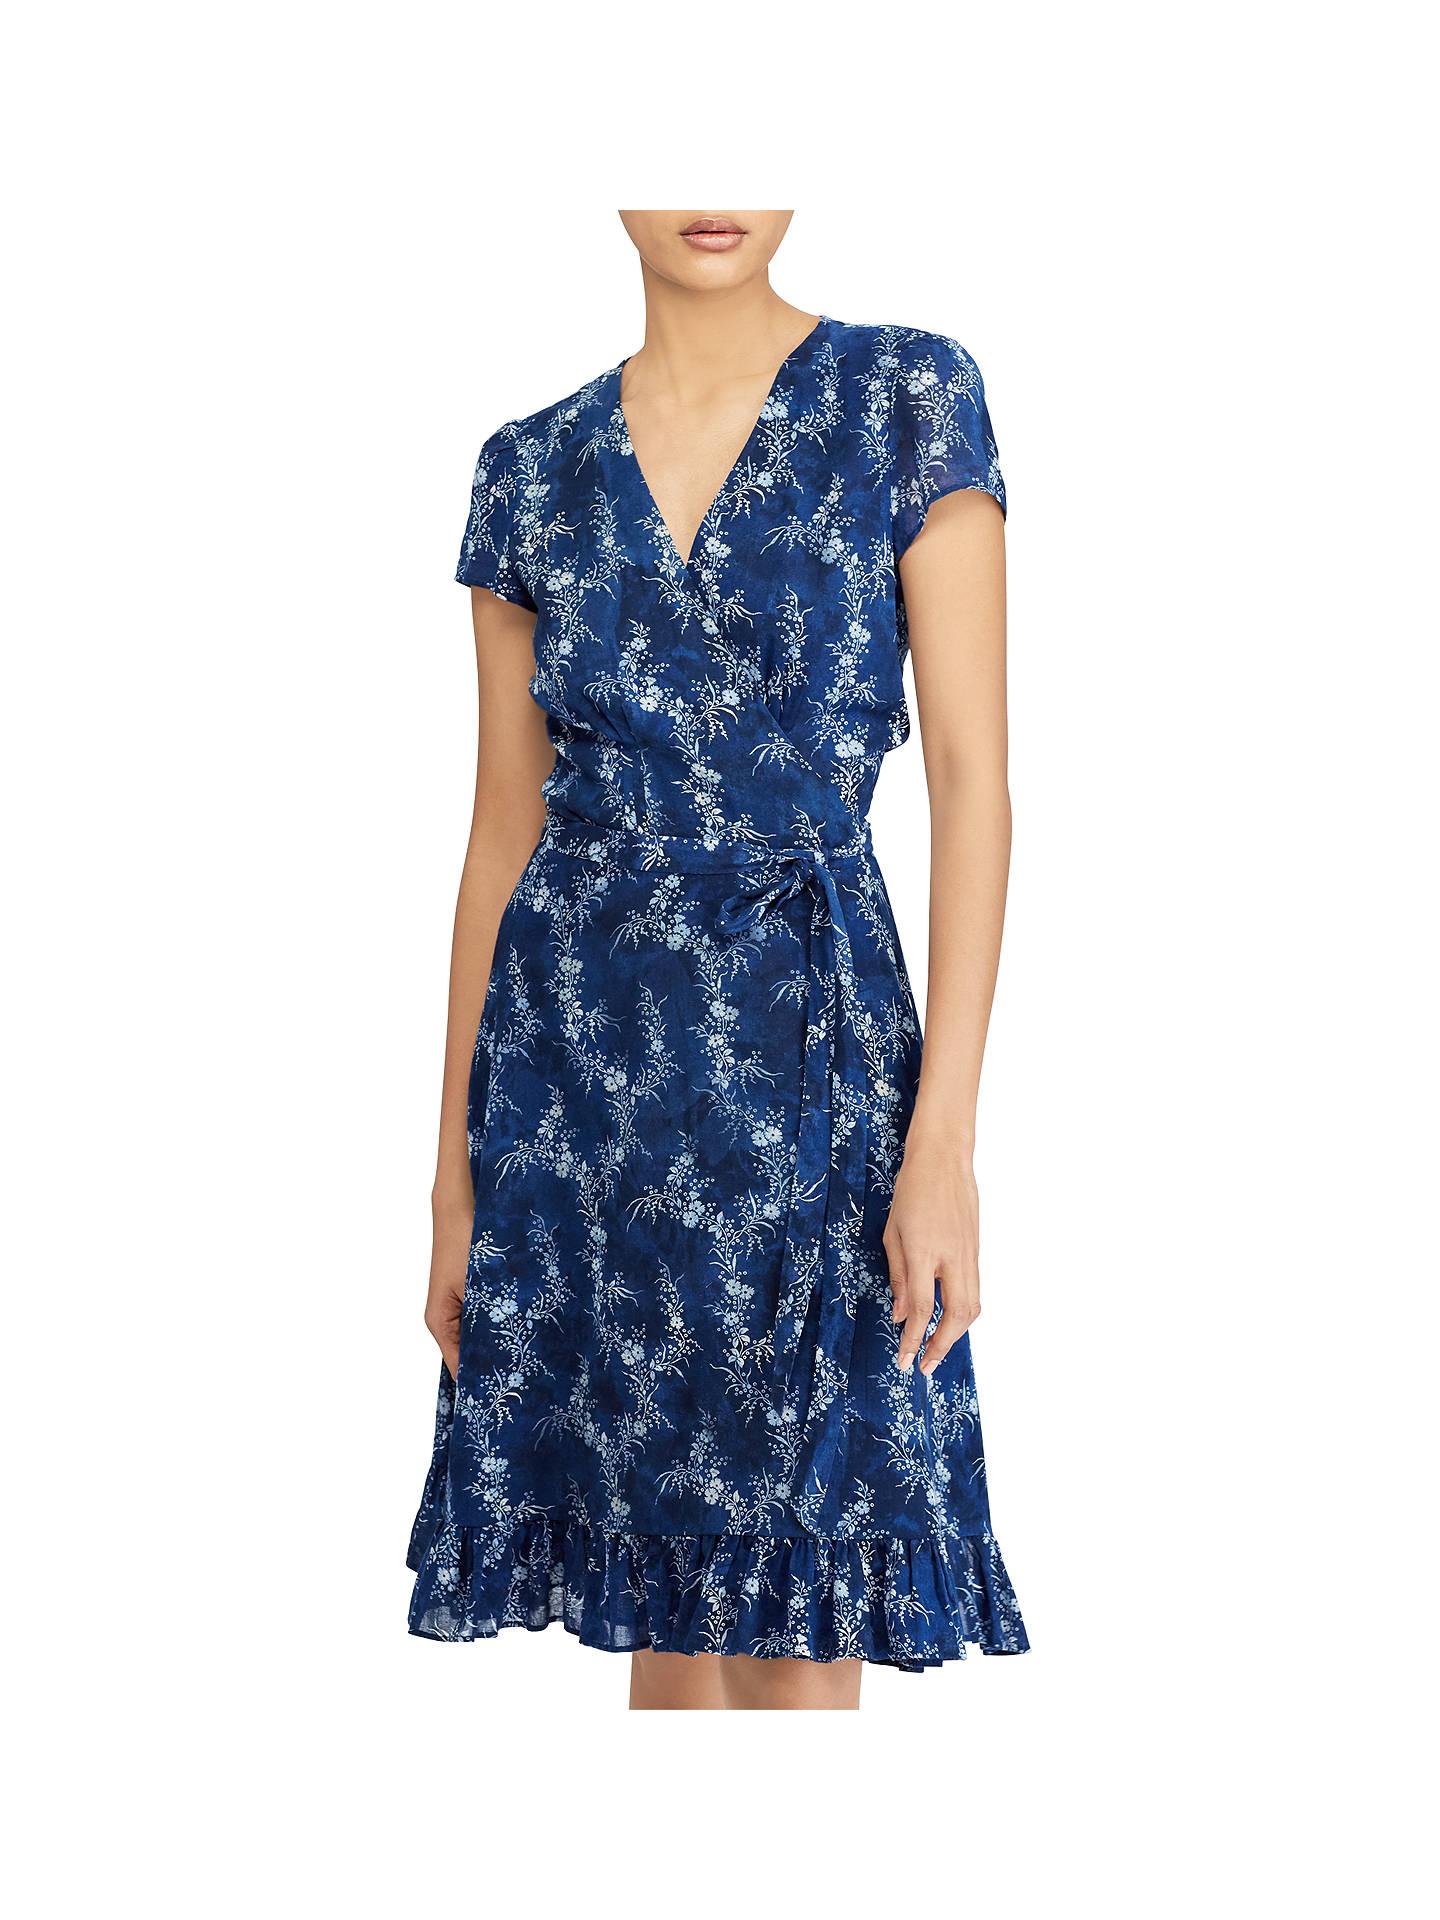 Polo Ralph Lauren Floral Print Gauze Wrap Dress Sun Fade Floral At